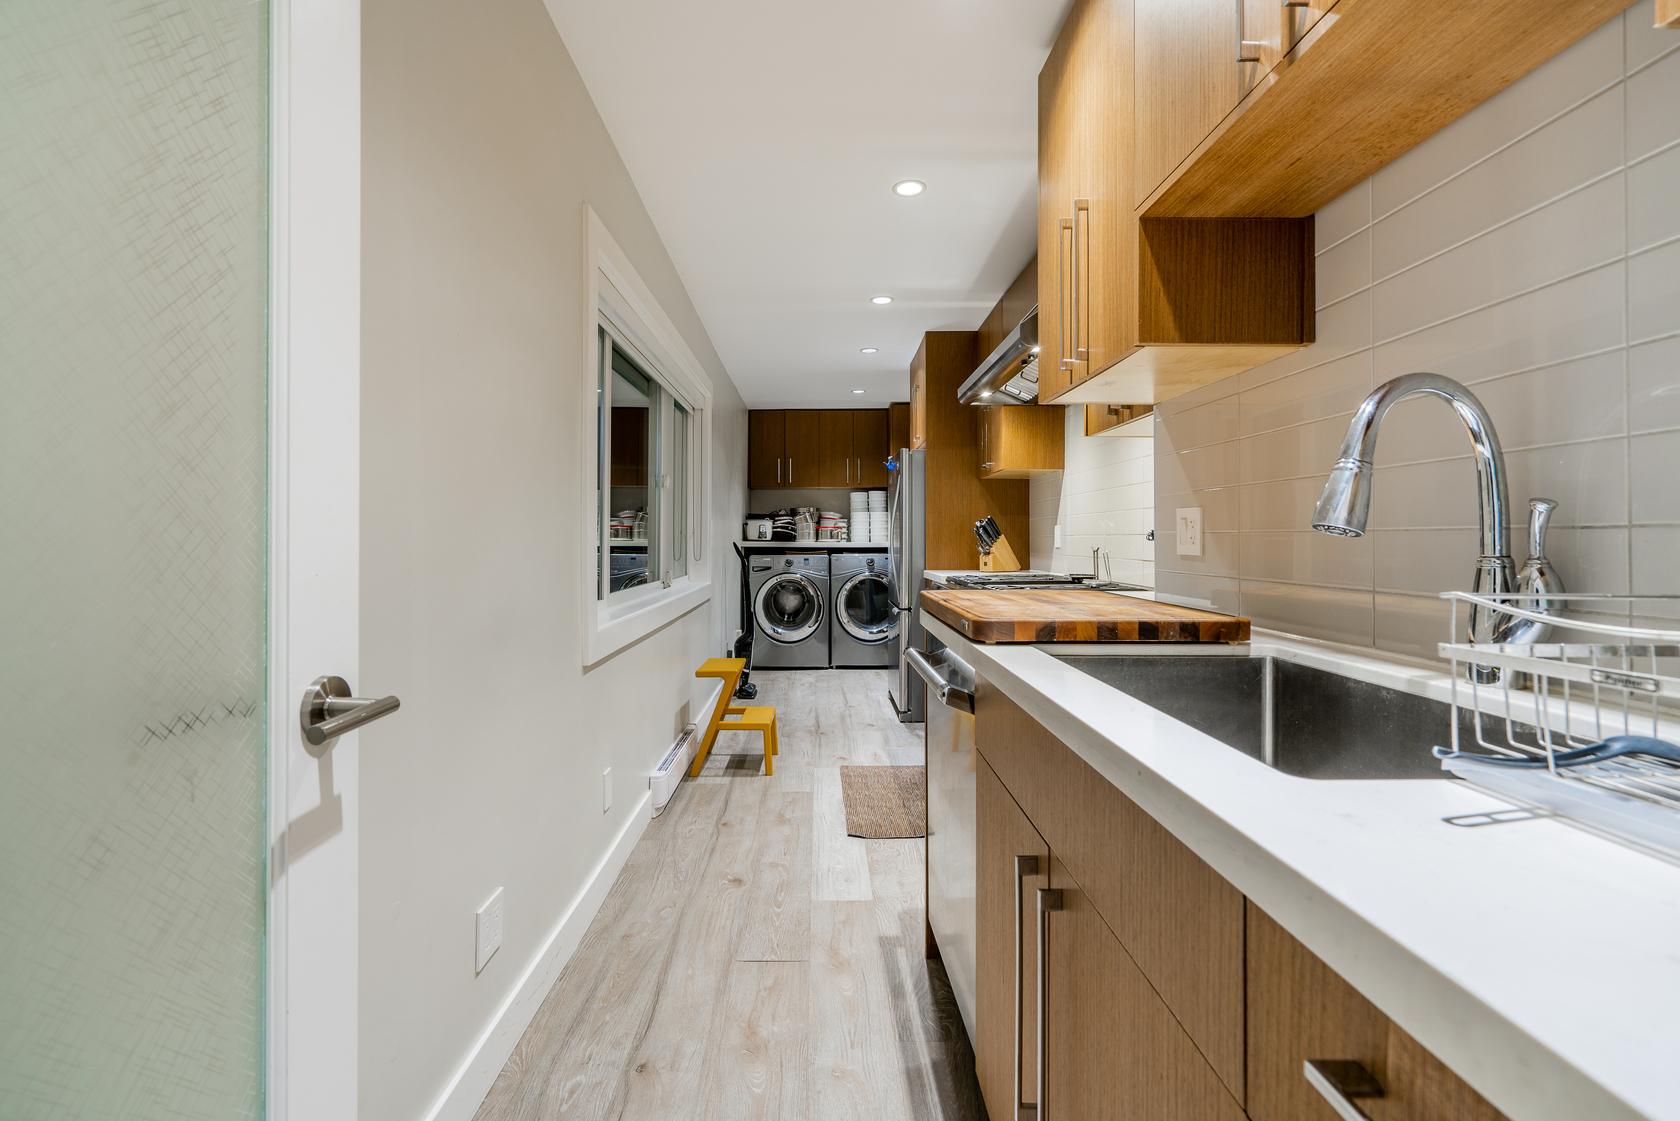 701-kenwood-road-west-vancouver-18 at 701 Kenwood Road, British Properties, West Vancouver